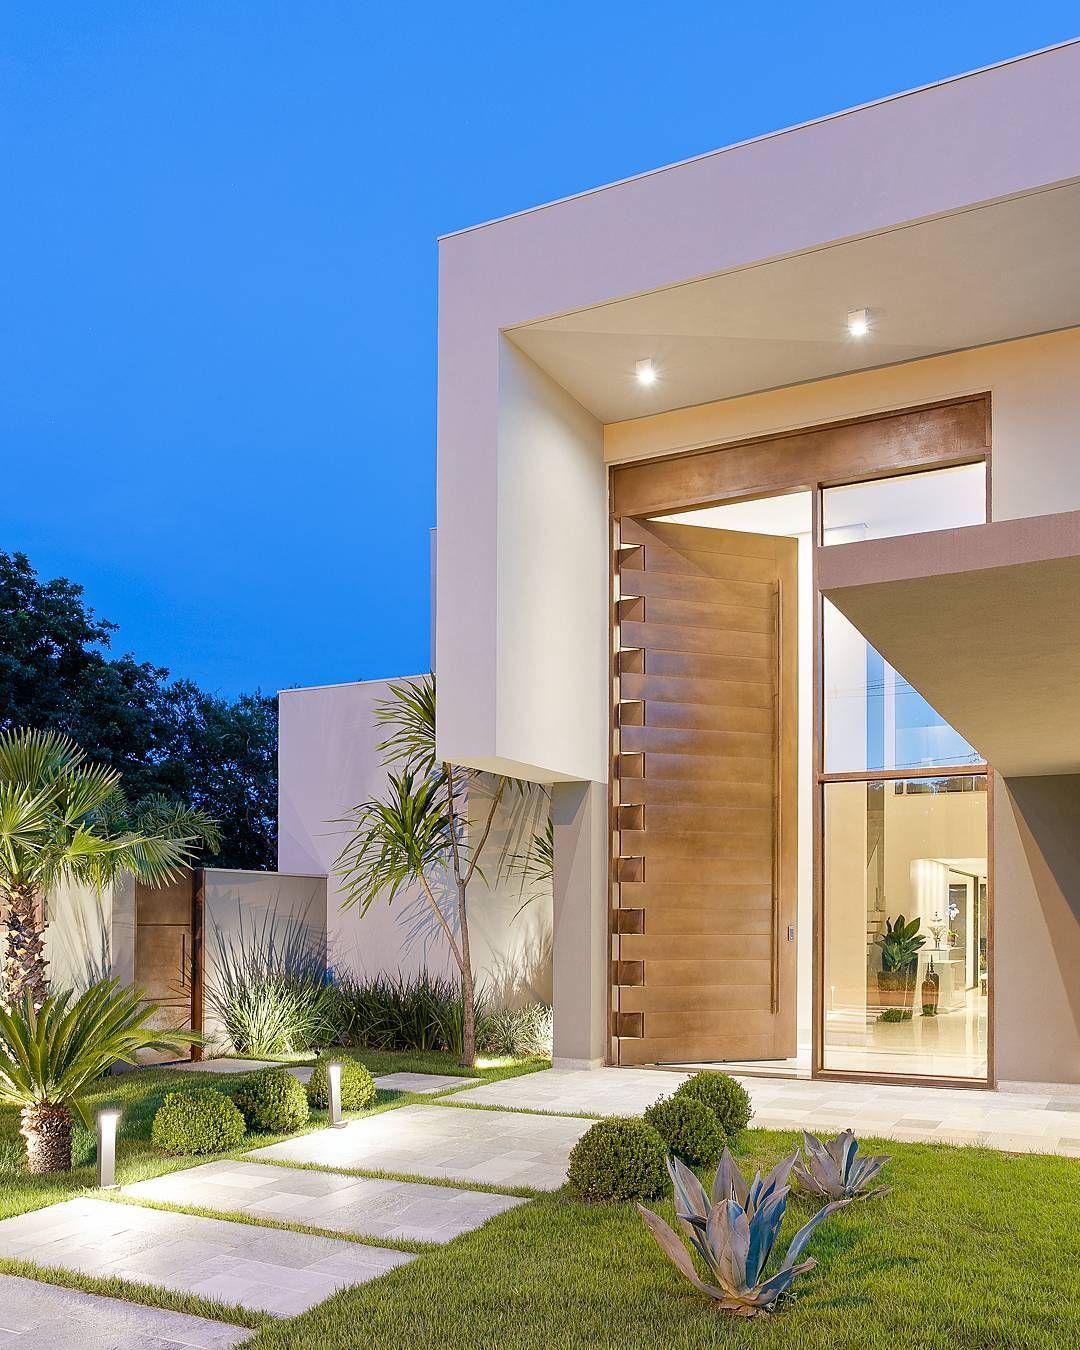 Fachada de casa contempor nea com porta painel de madeira - Fachada de casa ...